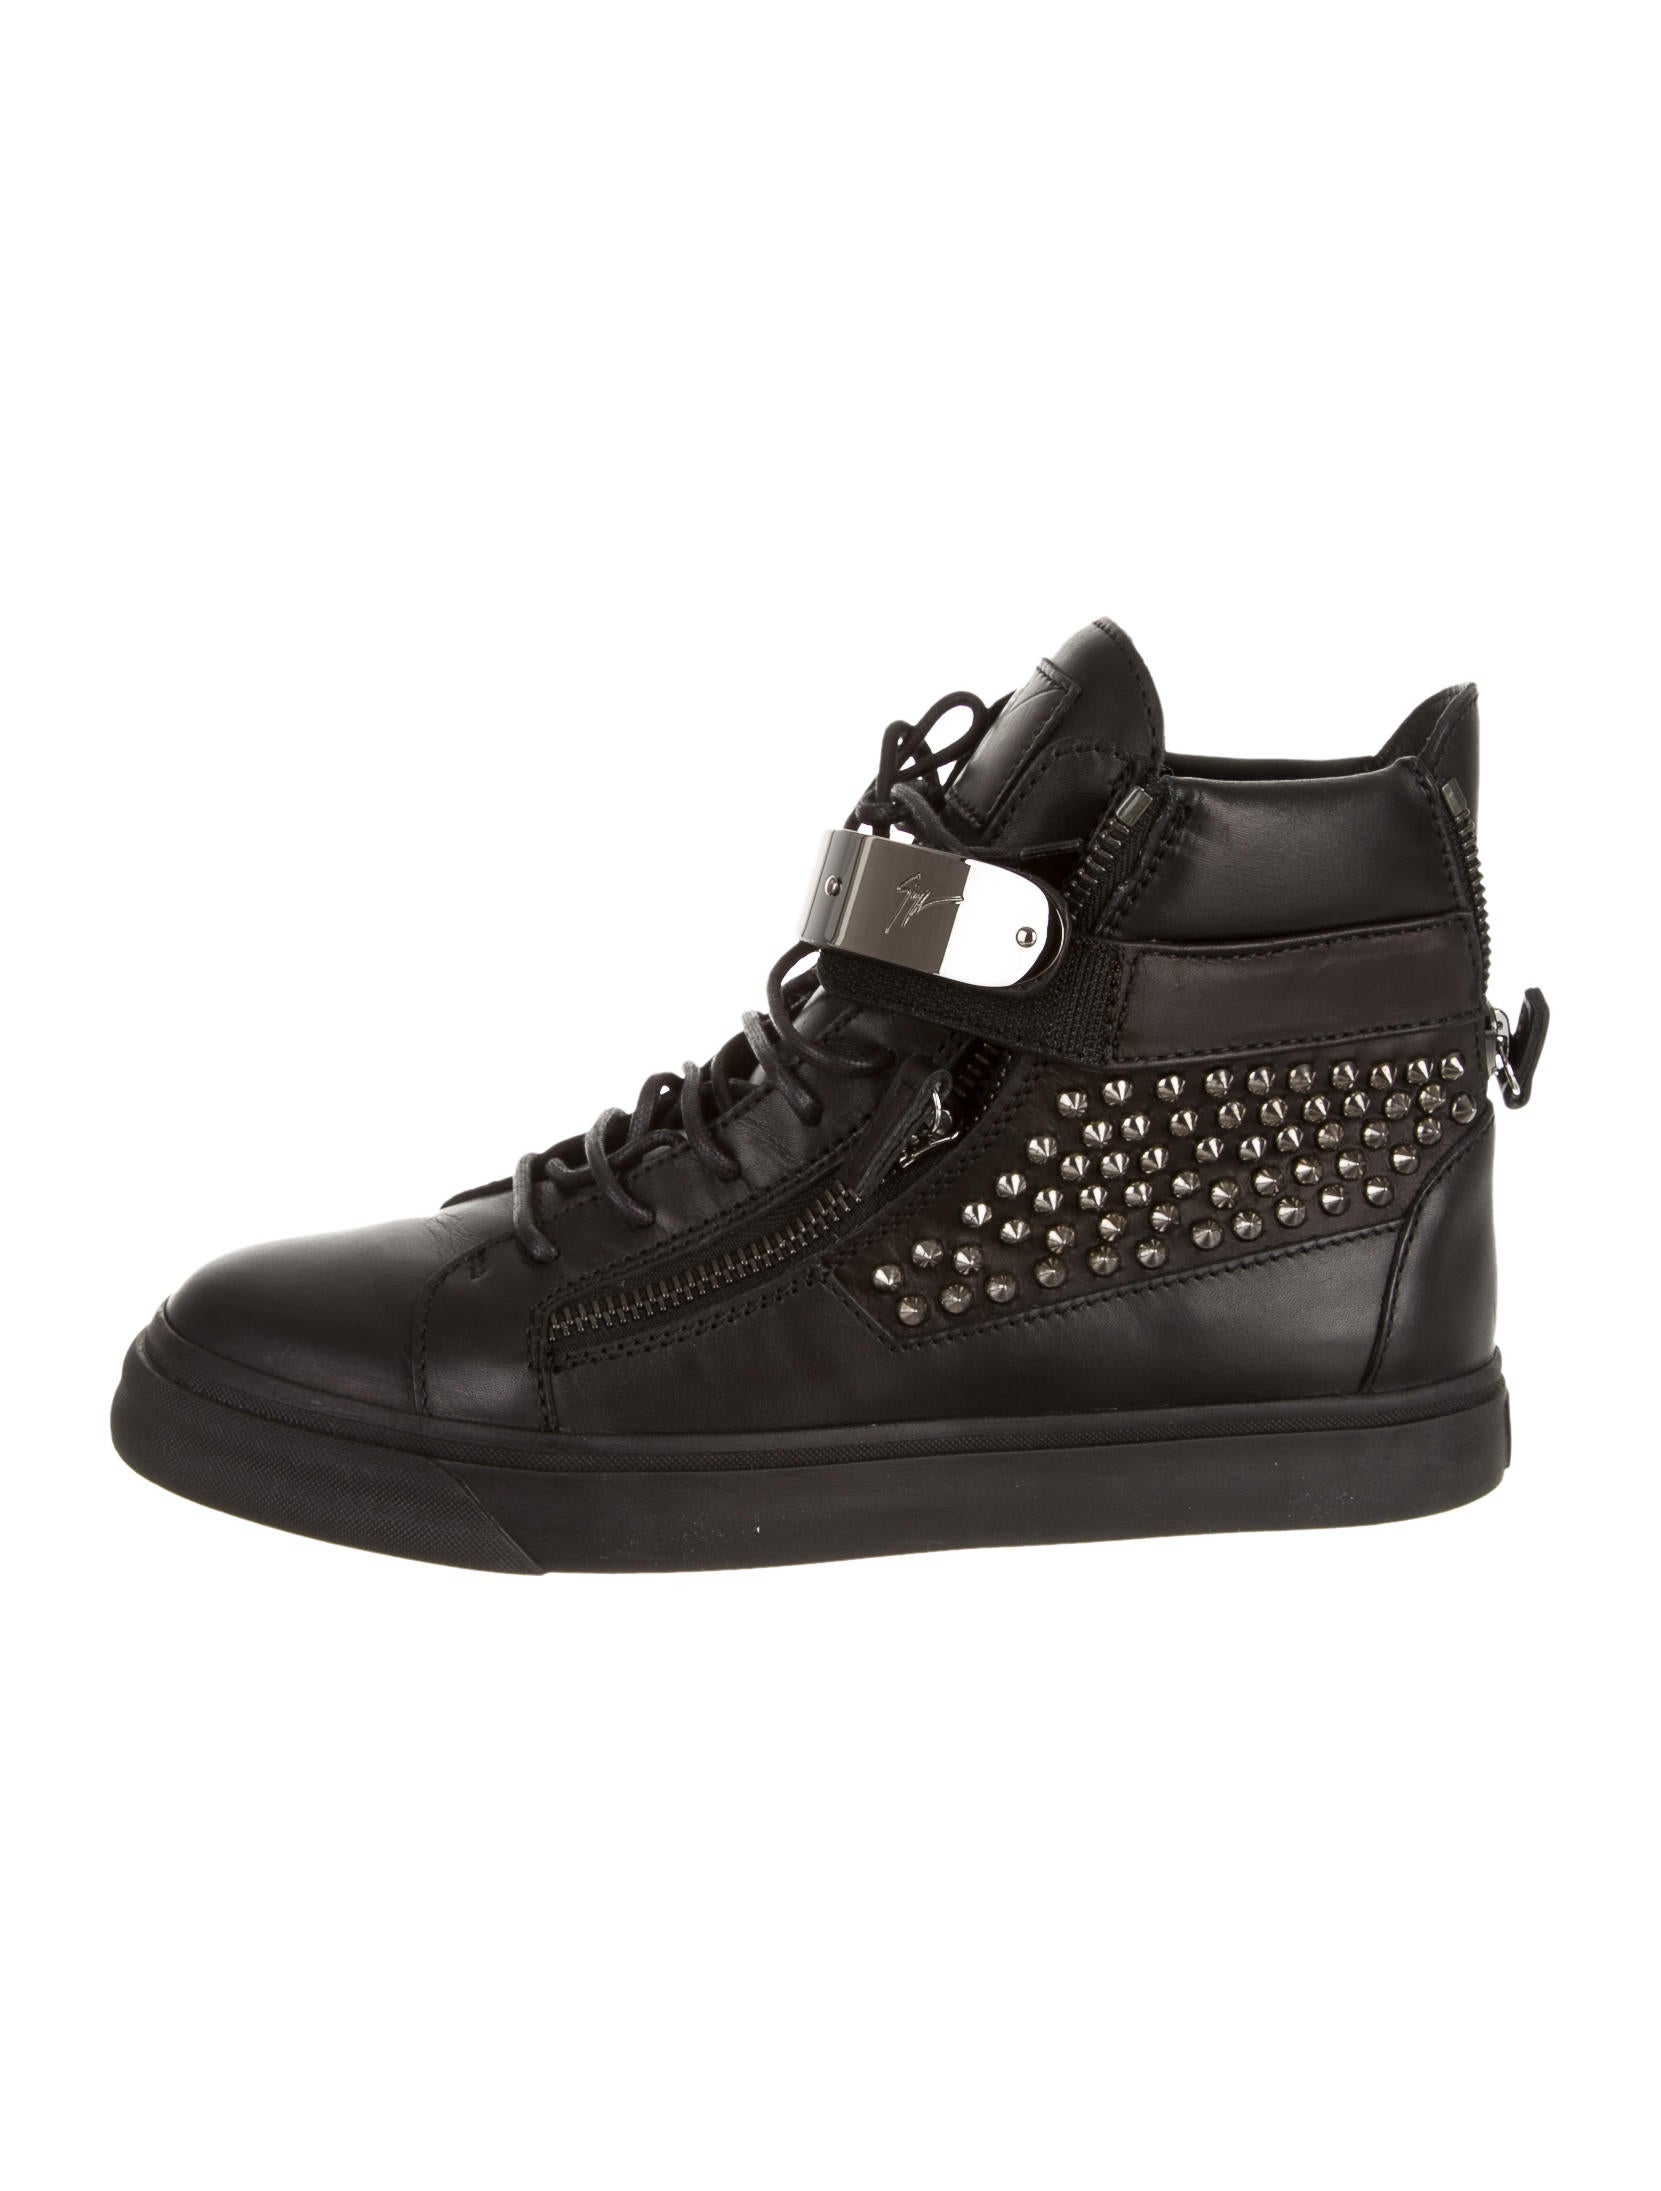 giuseppe zanotti sneakers mens shoes giu24597 the